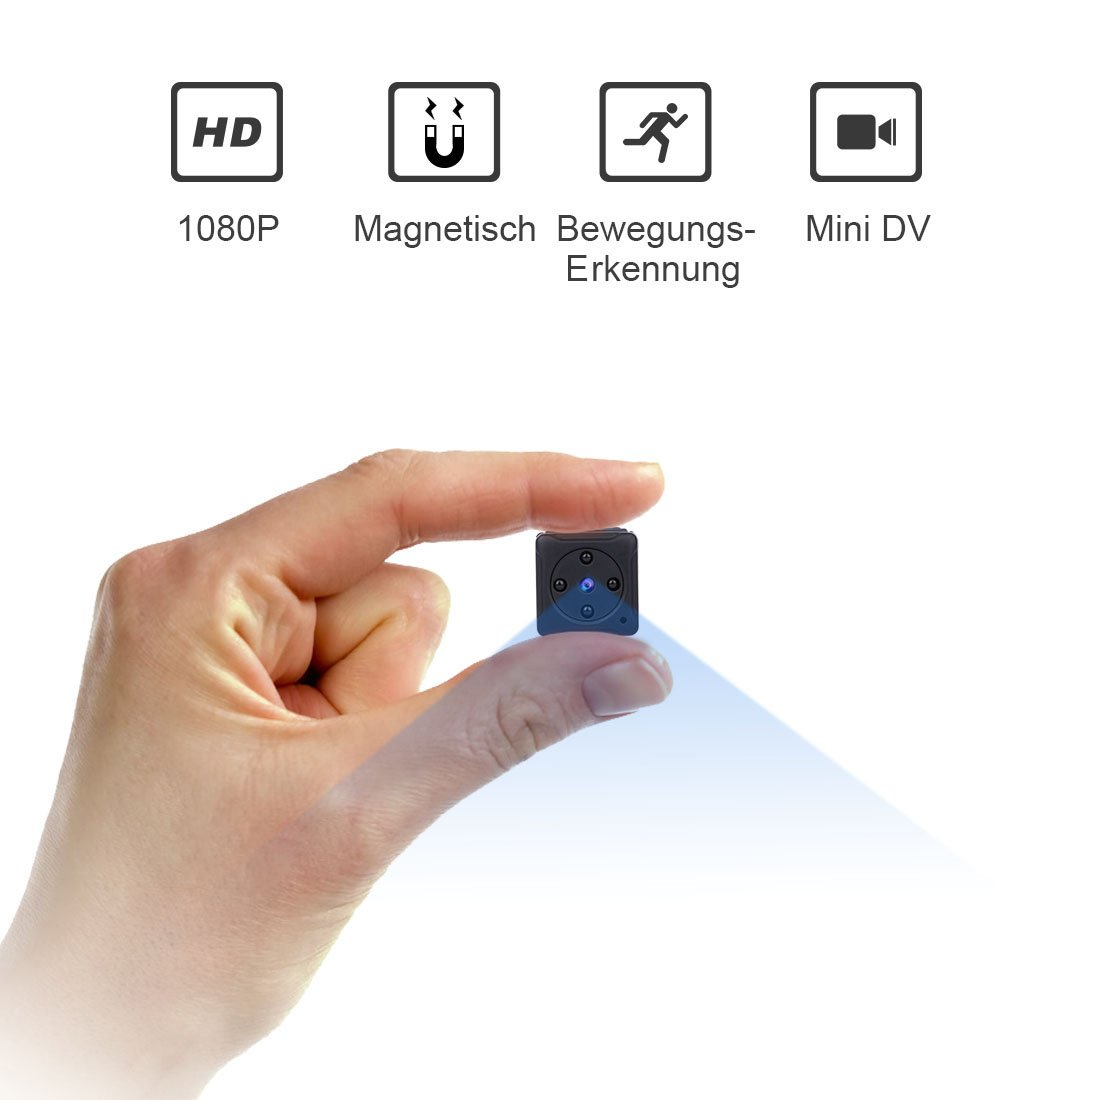 Mini Kamera,NIYPS Full HD 1080P Tragbare Kleine Überwachungskamera